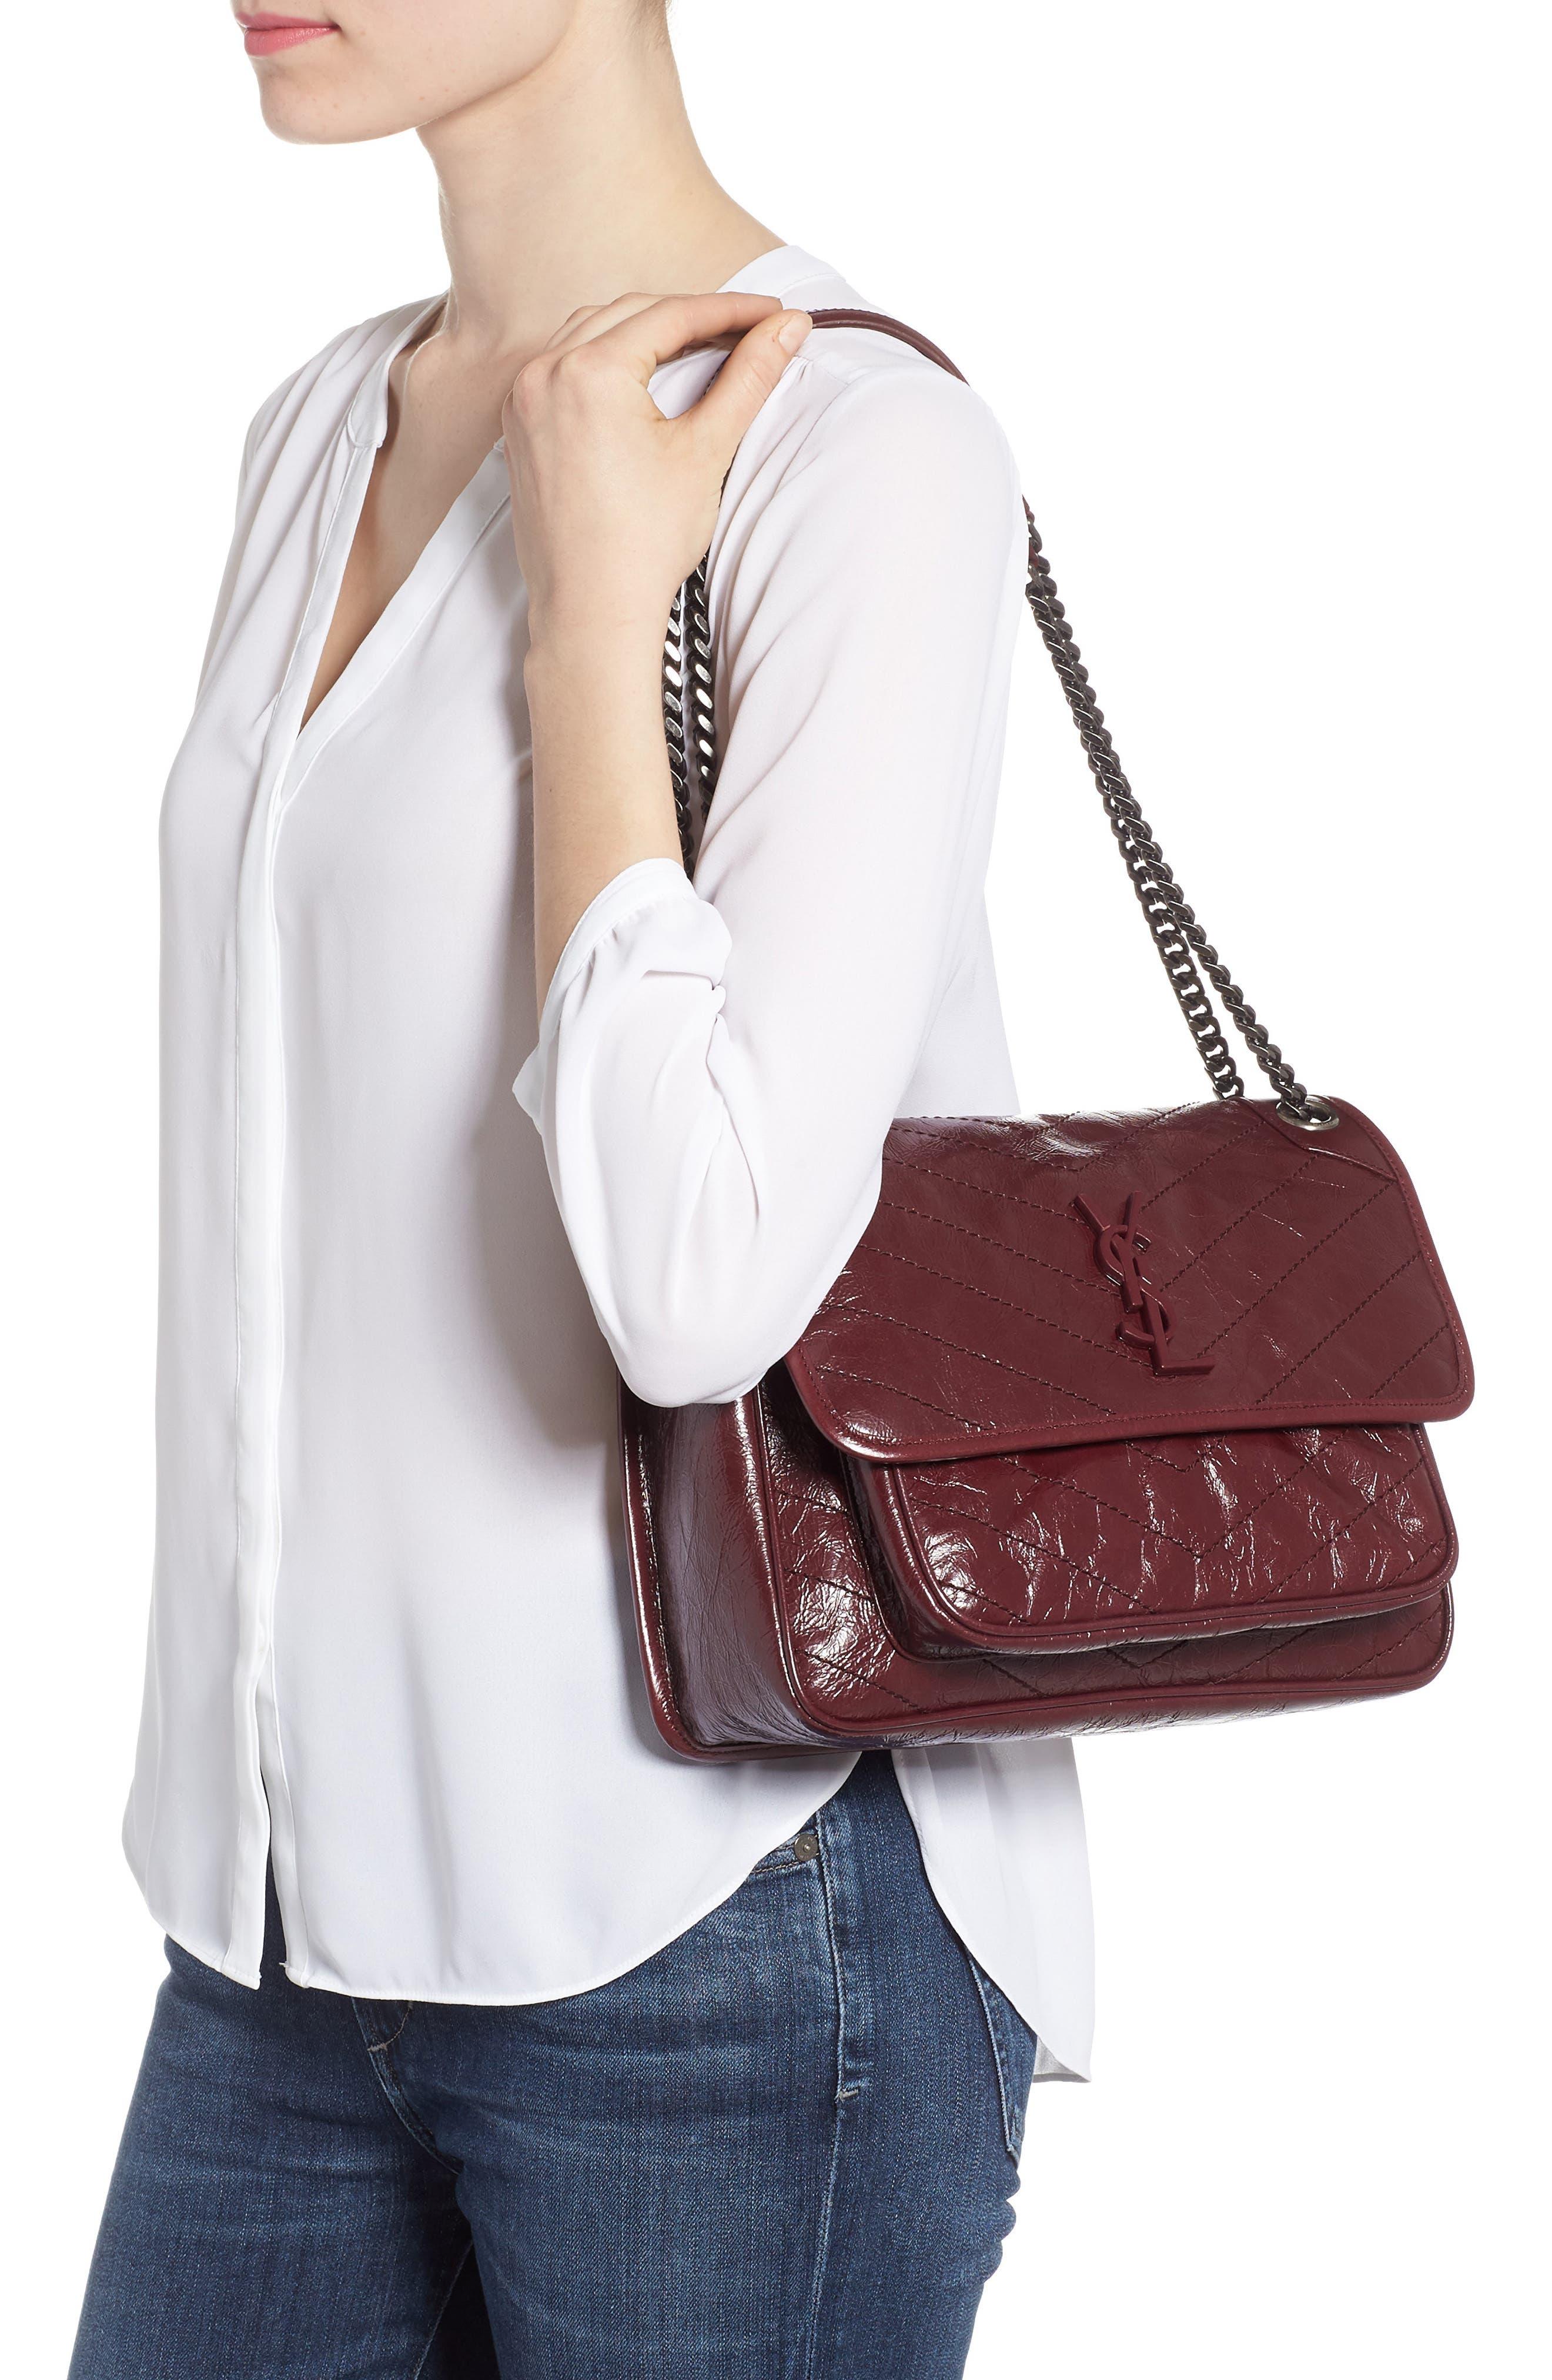 Medium Niki Leather Shoulder Bag,                             Alternate thumbnail 2, color,                             Rouge Legion